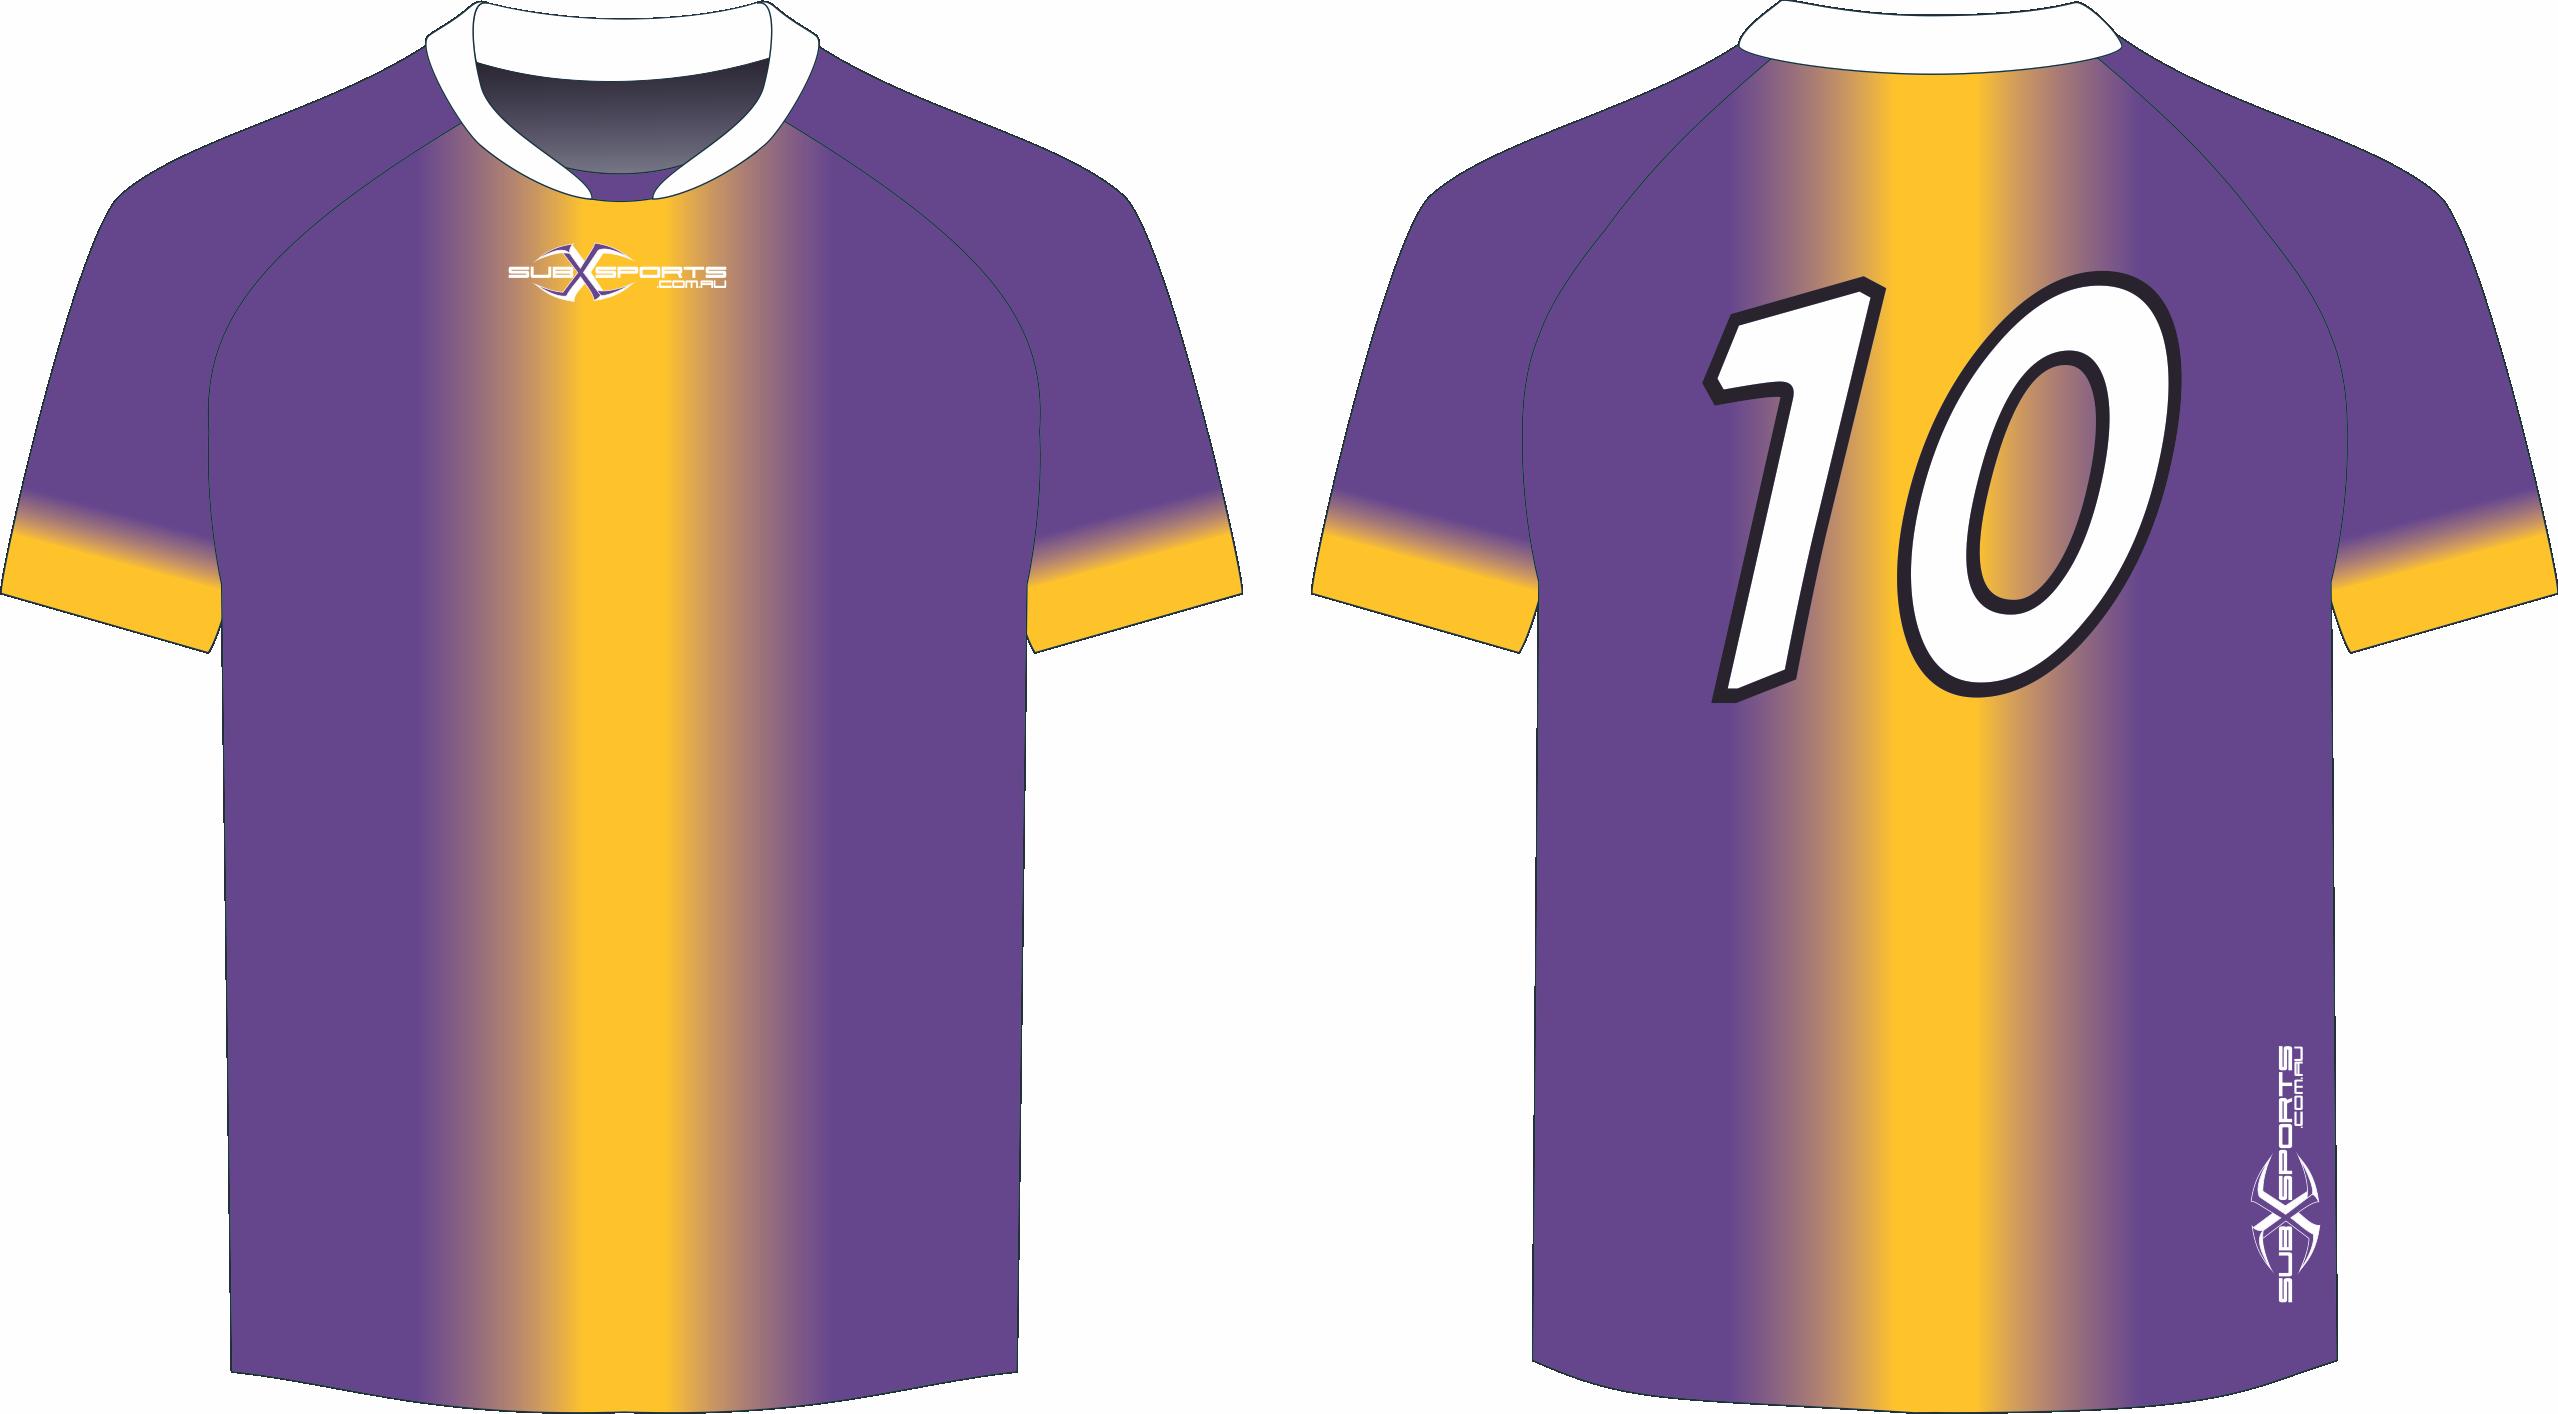 S205XJ Jersey Purple Gold.png